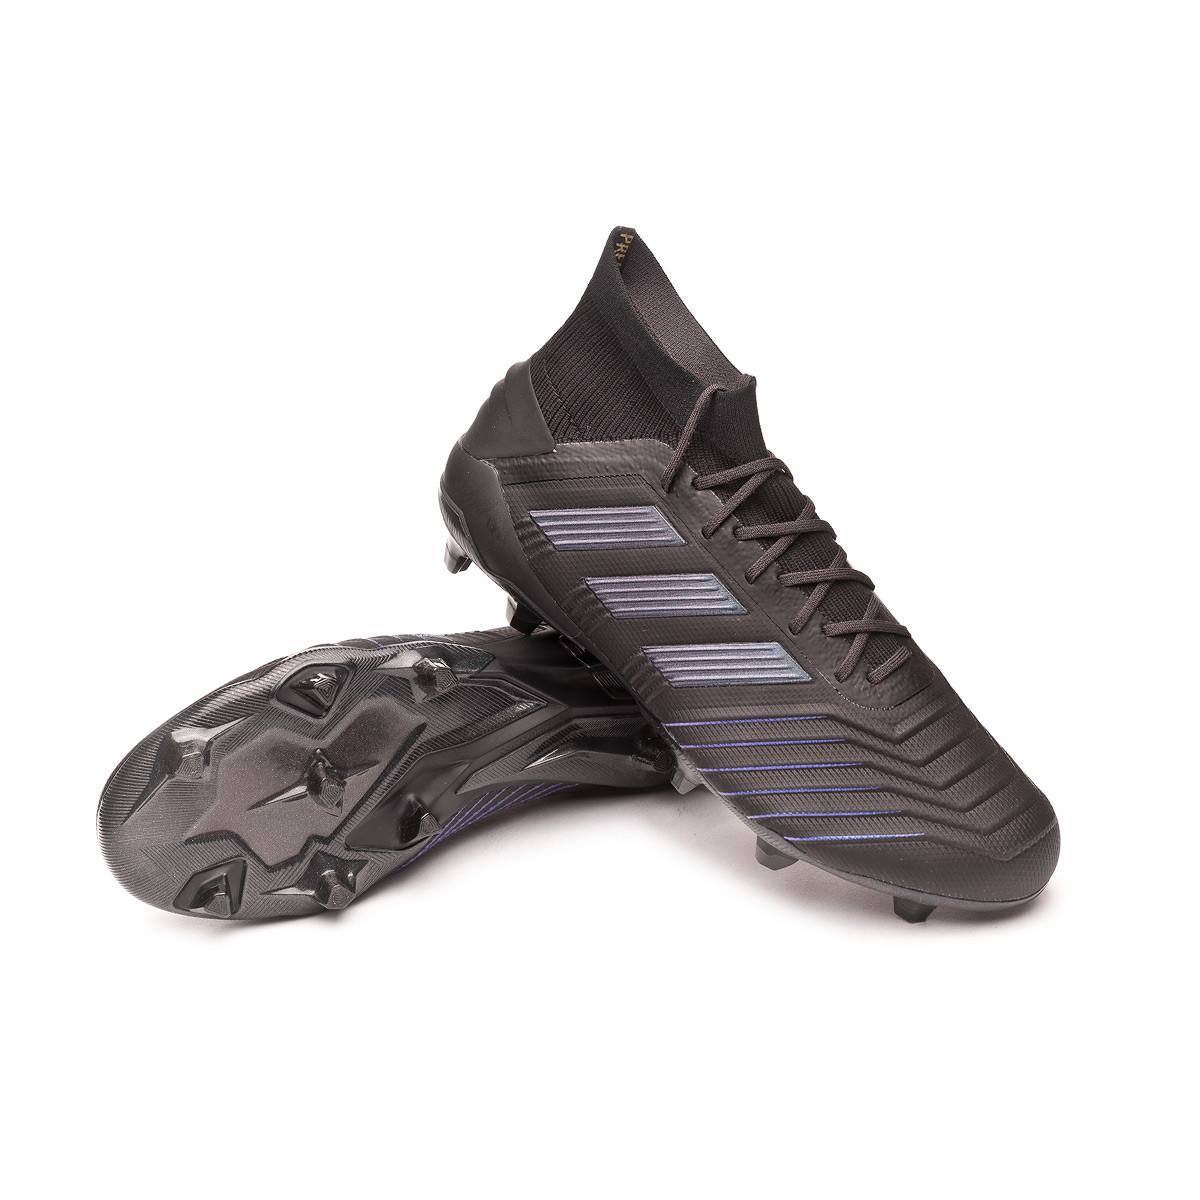 Chuteira de campo Adidas Predator 19.1